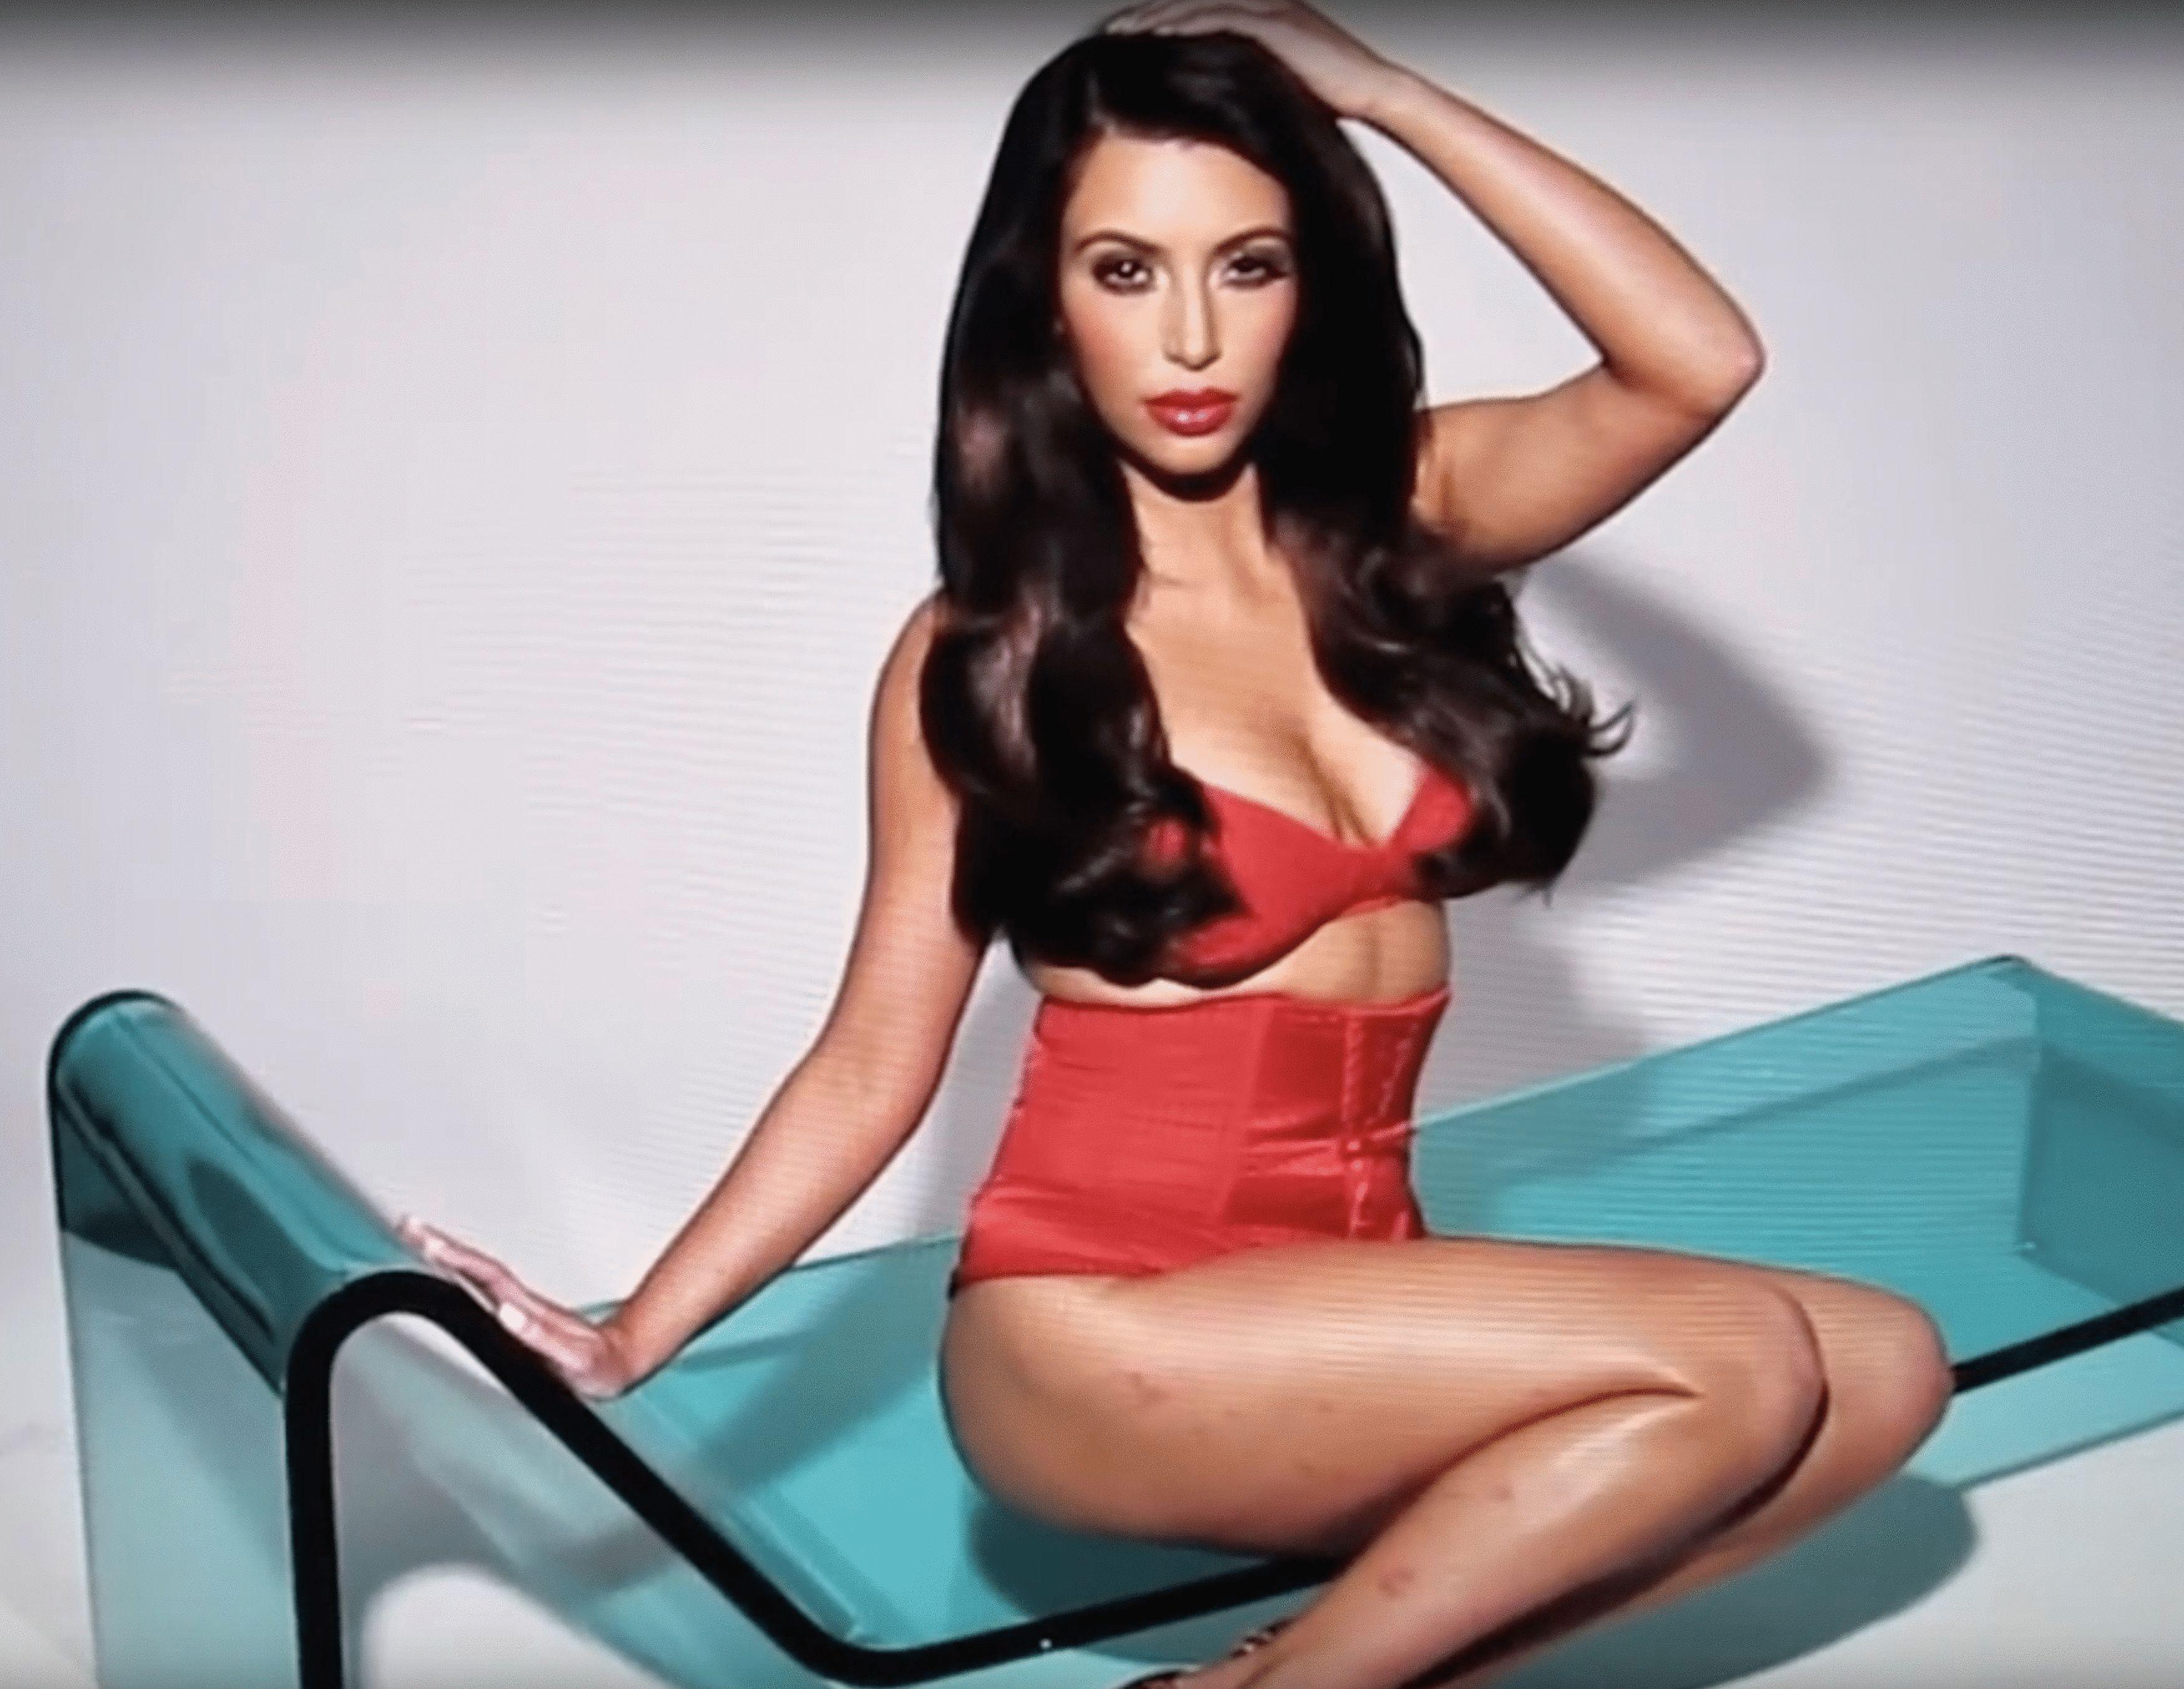 Kim Kardashian, enfermedad, psoriasis, piel, manchas